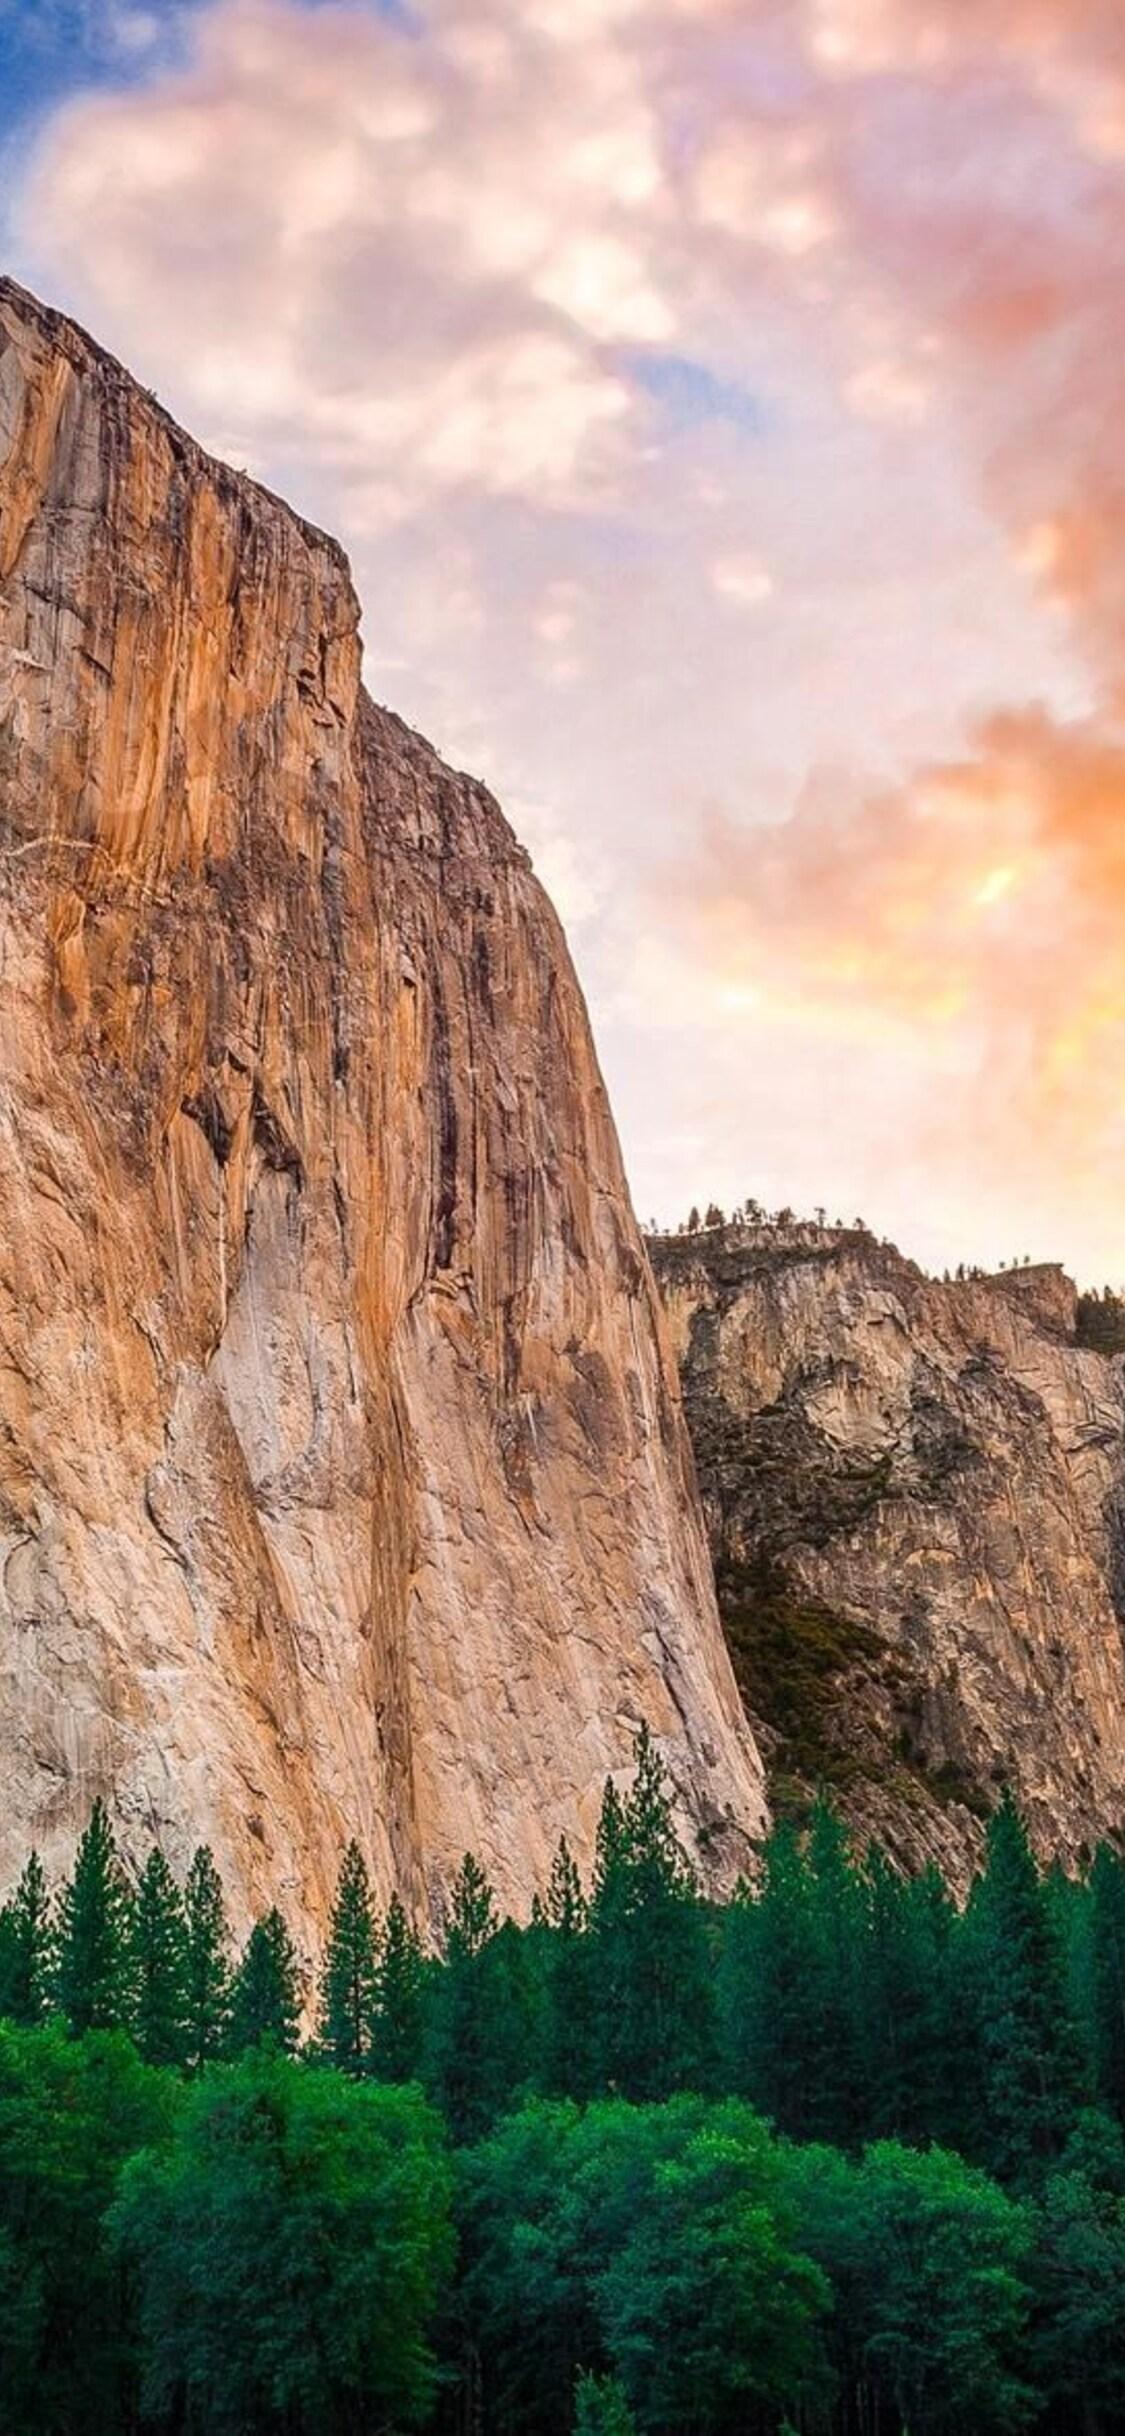 1125x2436 Yosemite Mountains Iphone Xs Iphone 10 Iphone X Hd